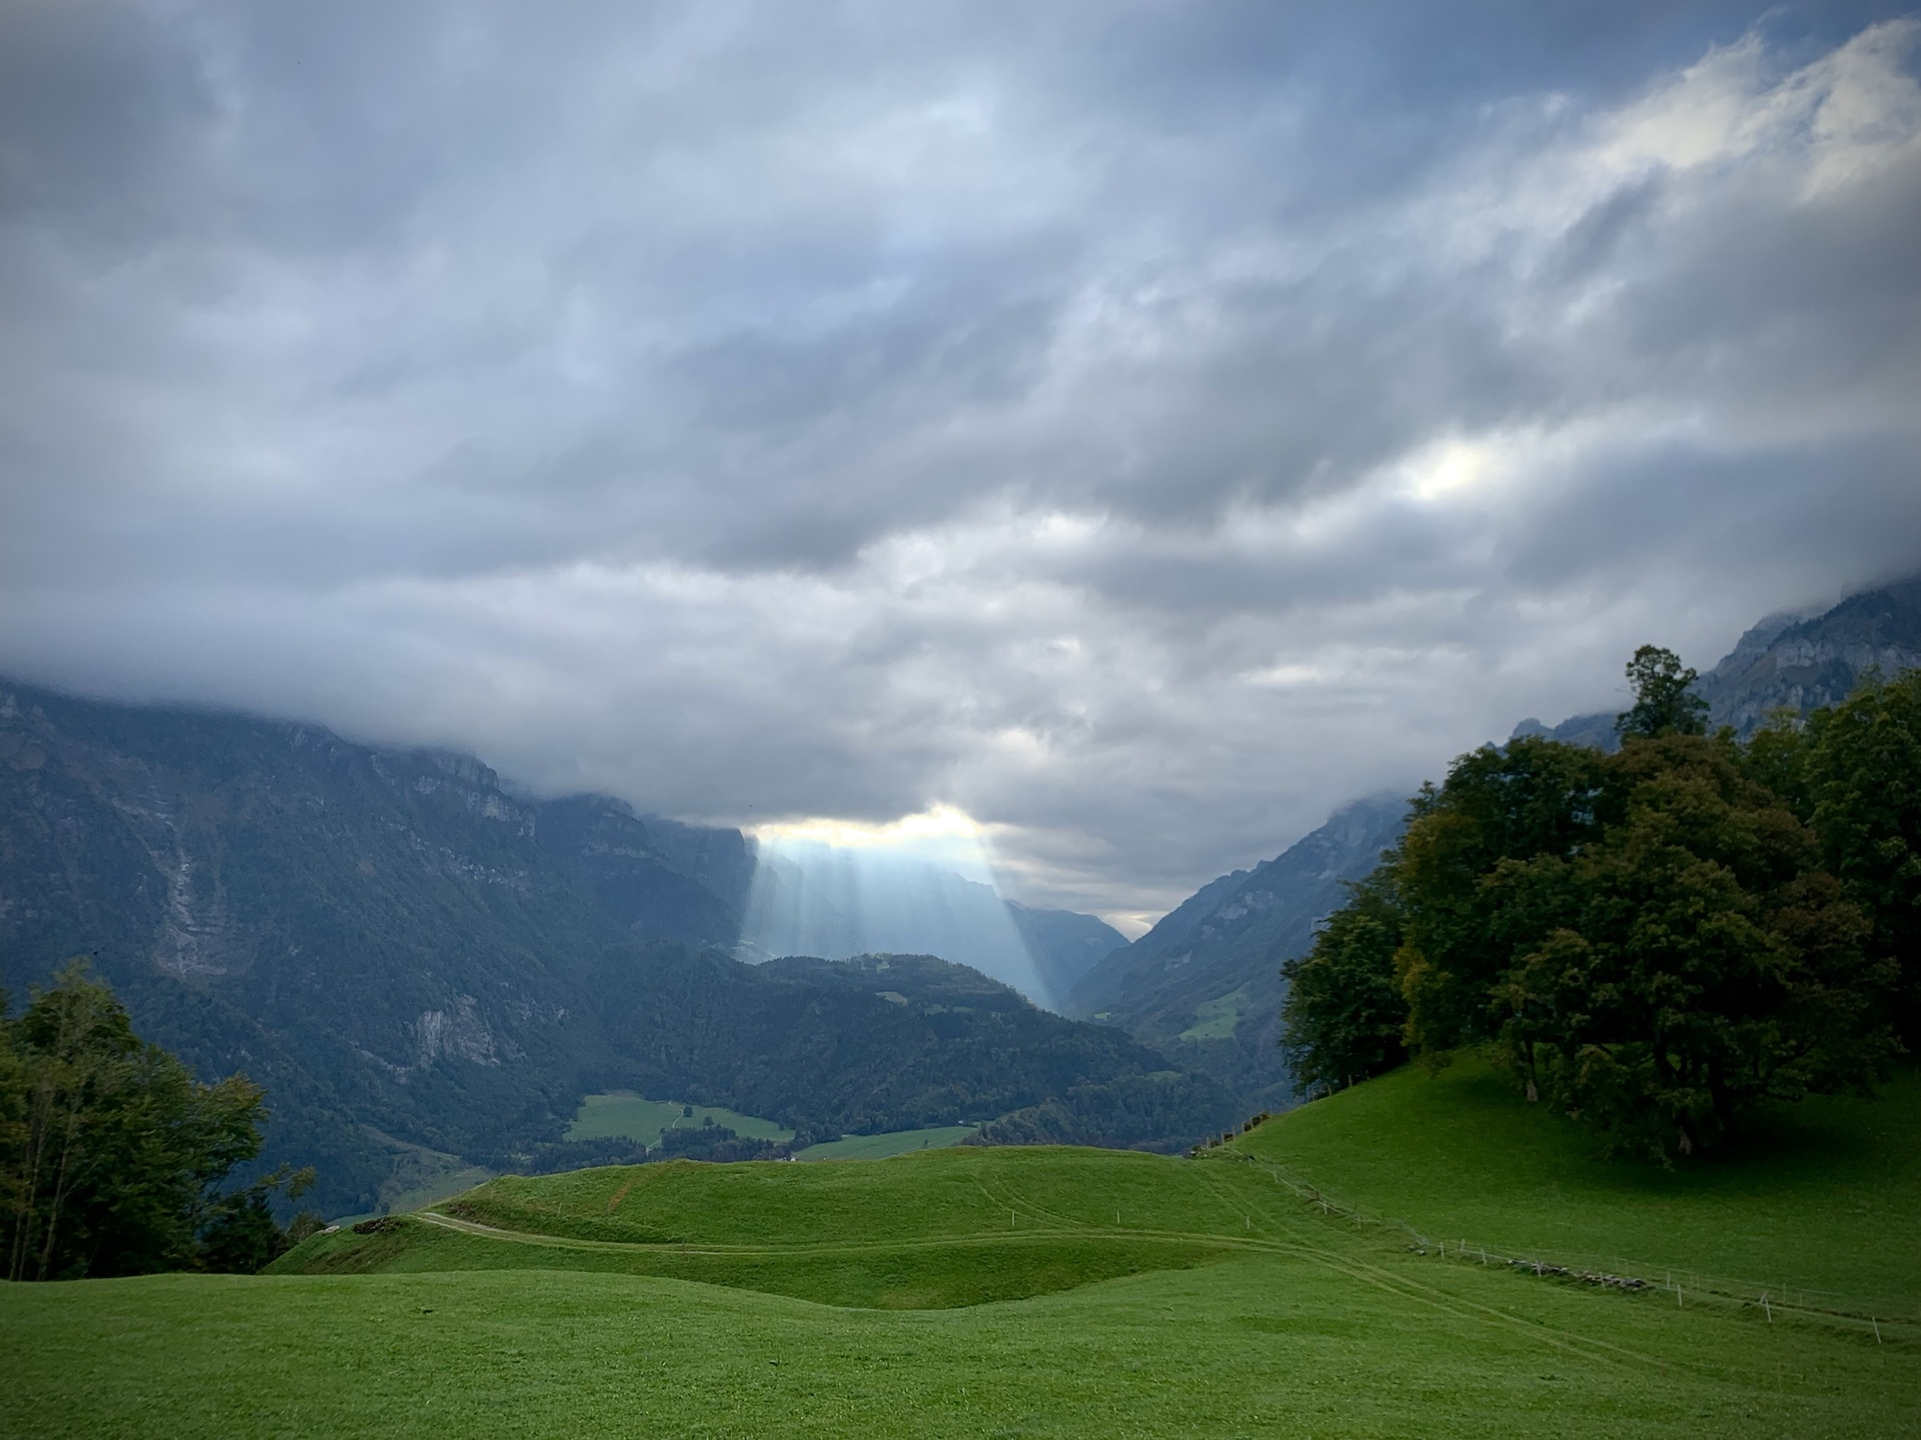 Hand of God - Schwammhöhe - Hiking Meditation